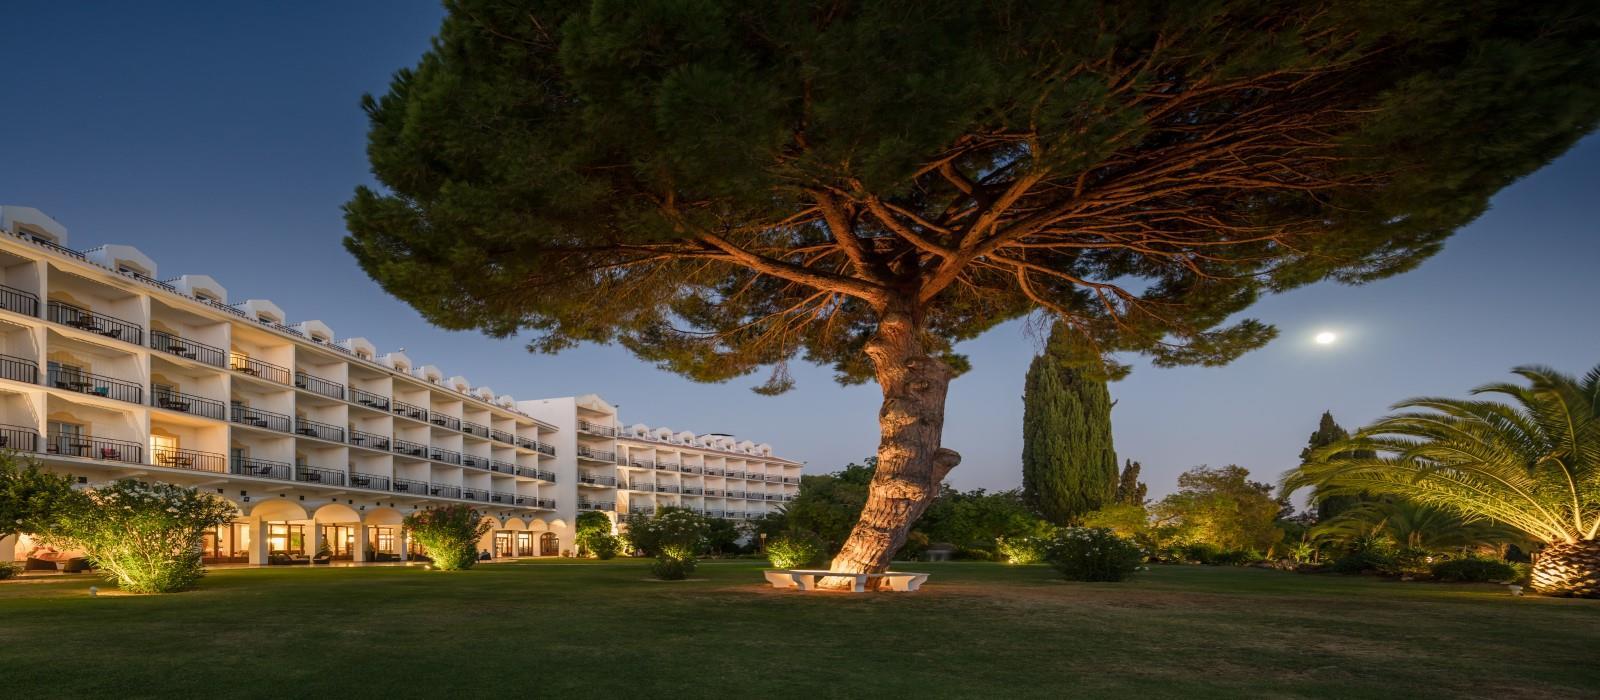 Penina Hotel & Golf Resort 5* - 3 Nights Bed & Breakfast, 3 Rounds